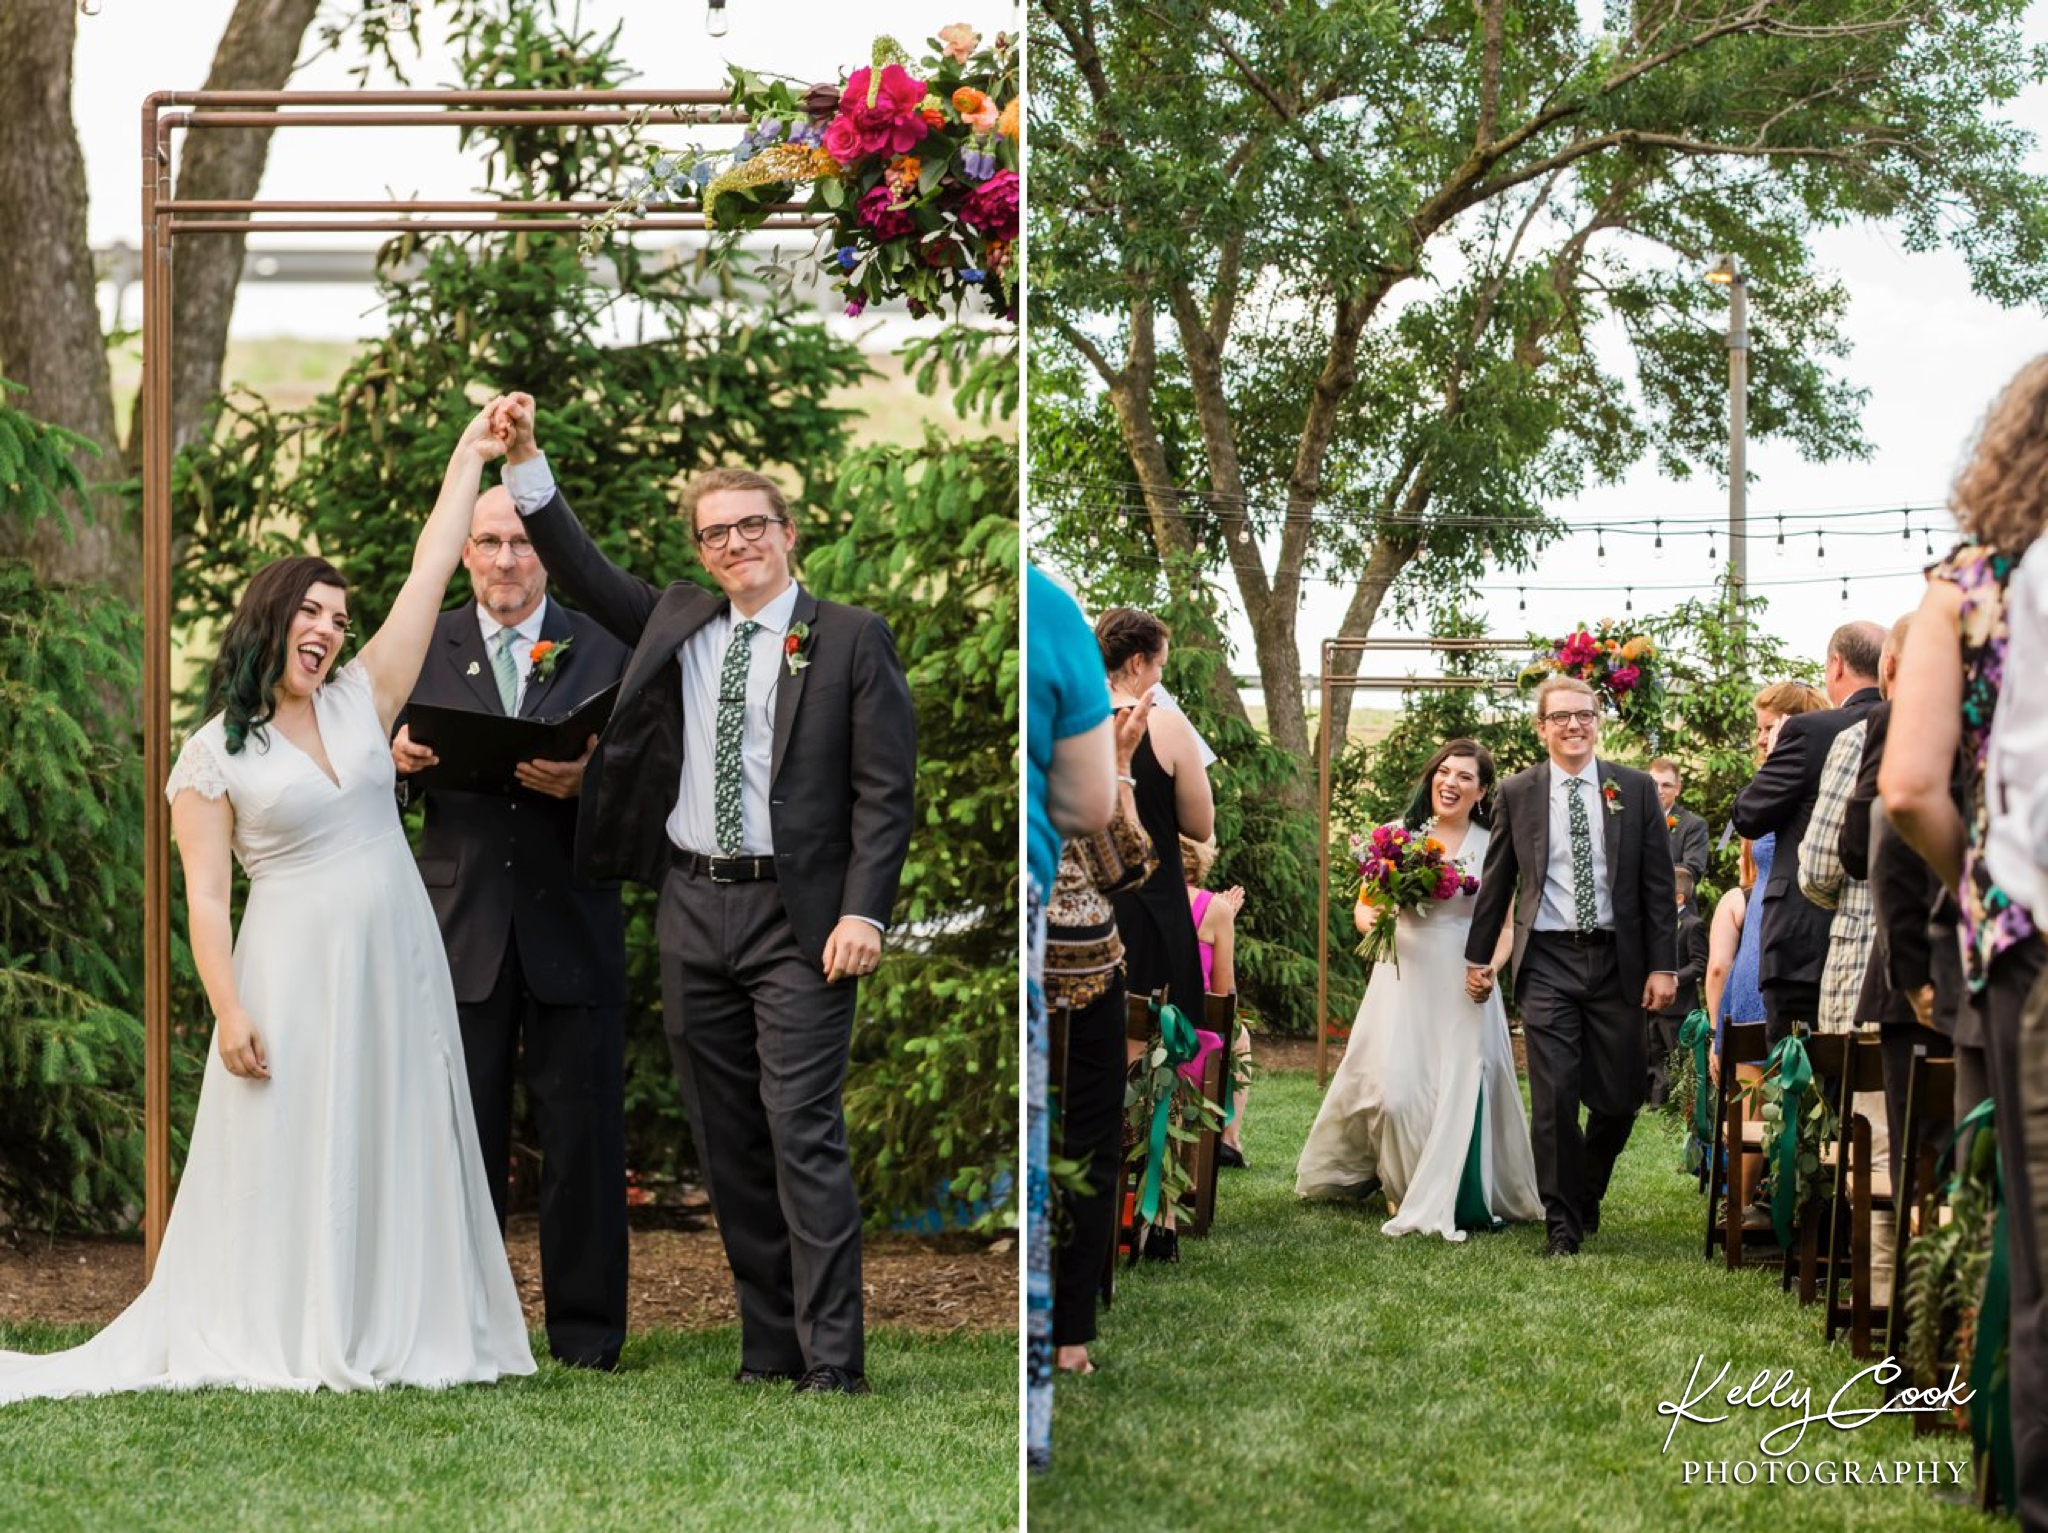 Wild Carrot wedding ceremony in St. Louis